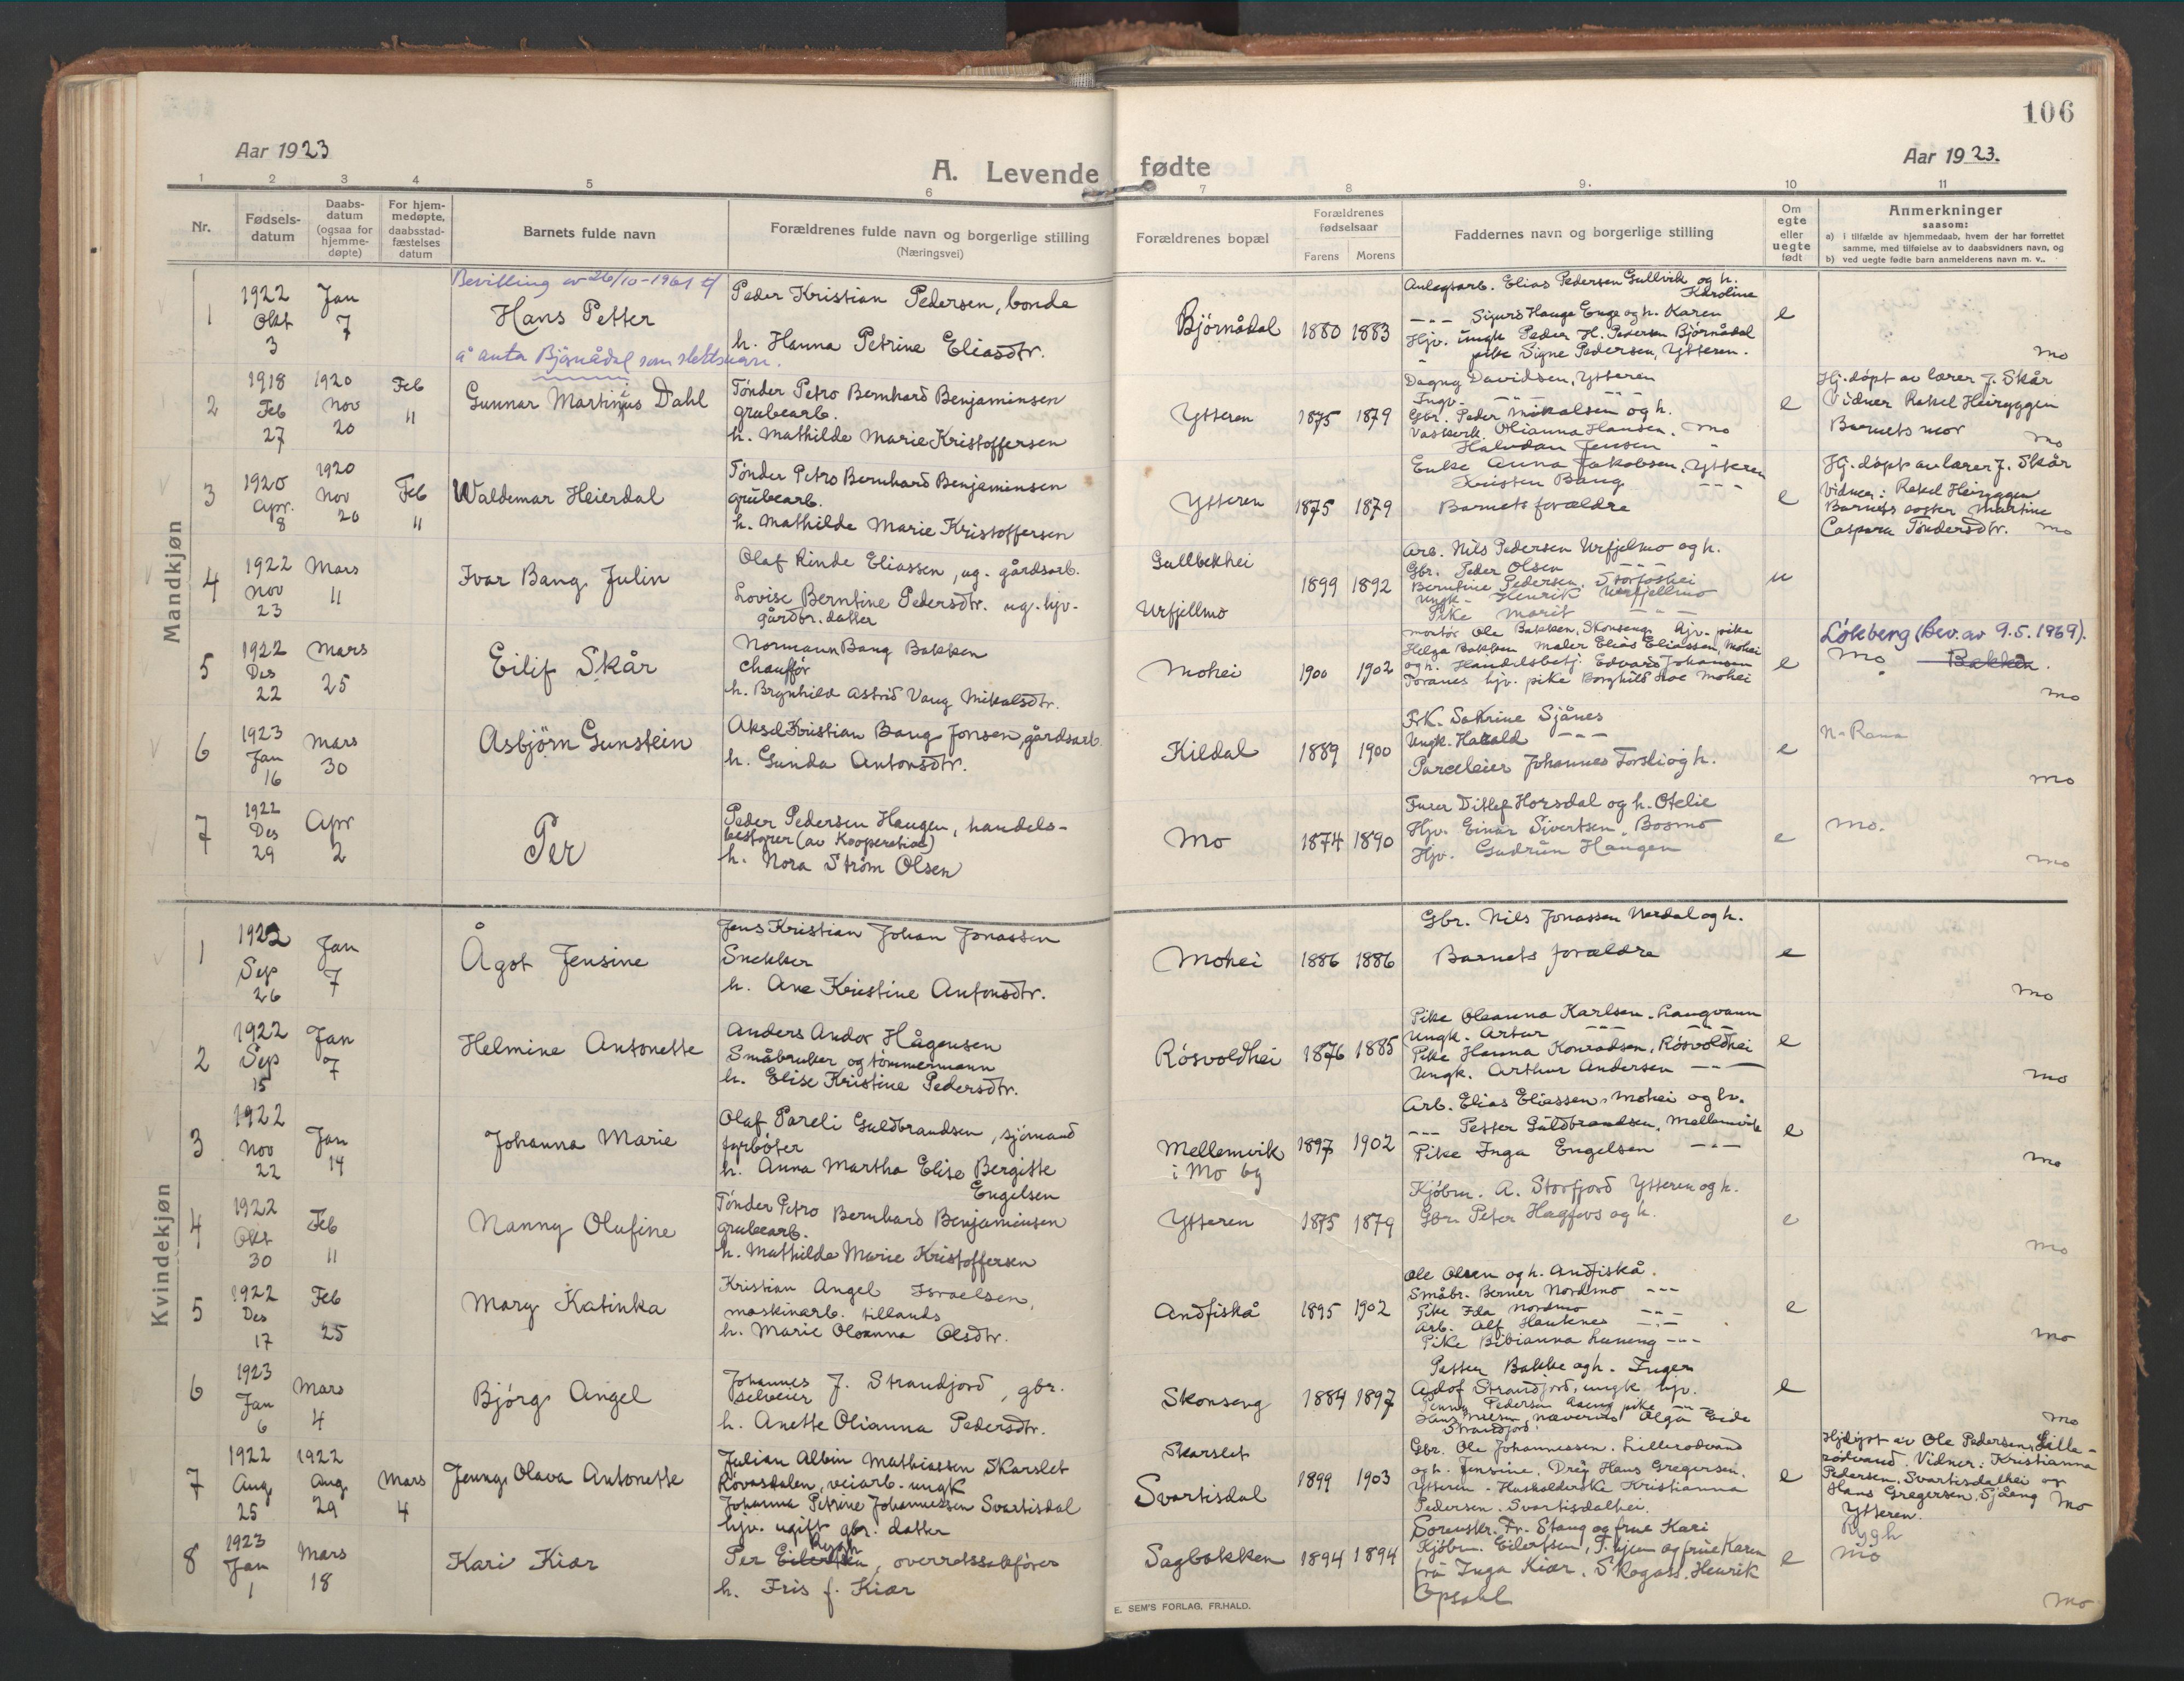 SAT, Ministerialprotokoller, klokkerbøker og fødselsregistre - Nordland, 827/L0404: Ministerialbok nr. 827A16, 1912-1925, s. 106